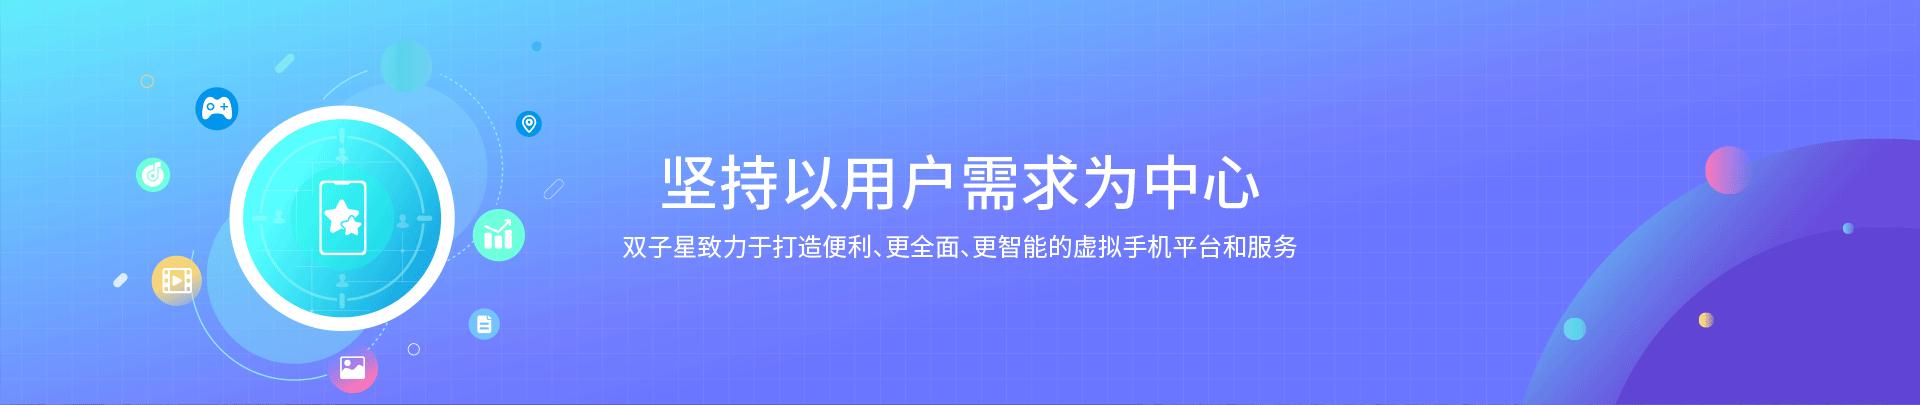 https://www.androidscloud.com/uploads//20210812/07f4c1d09ce84693aef502773efab56c.png